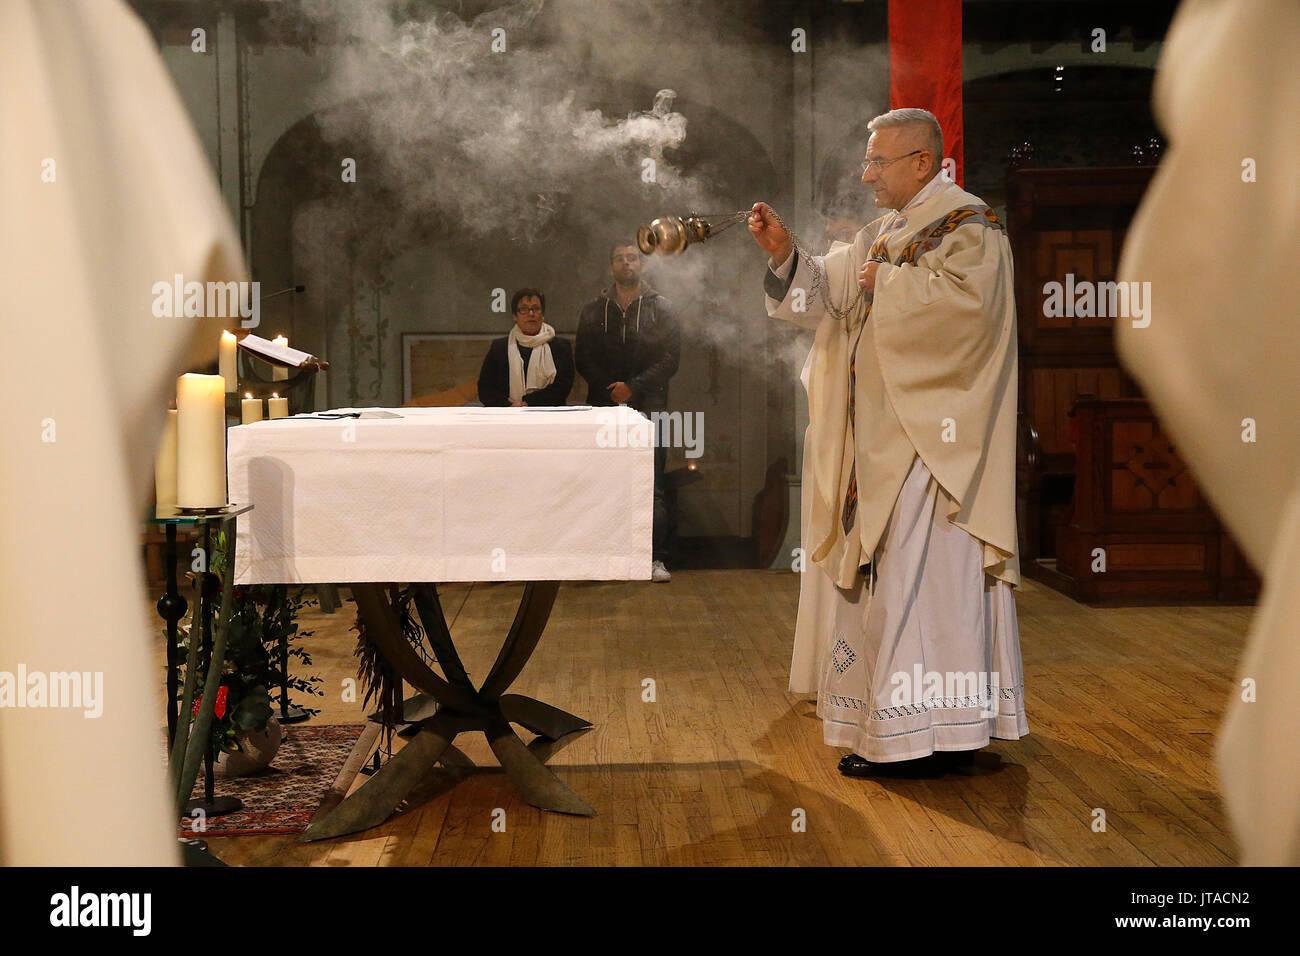 Maundy Thursday celebration in a Parisian Catholic church, Paris, France, Europe - Stock Image